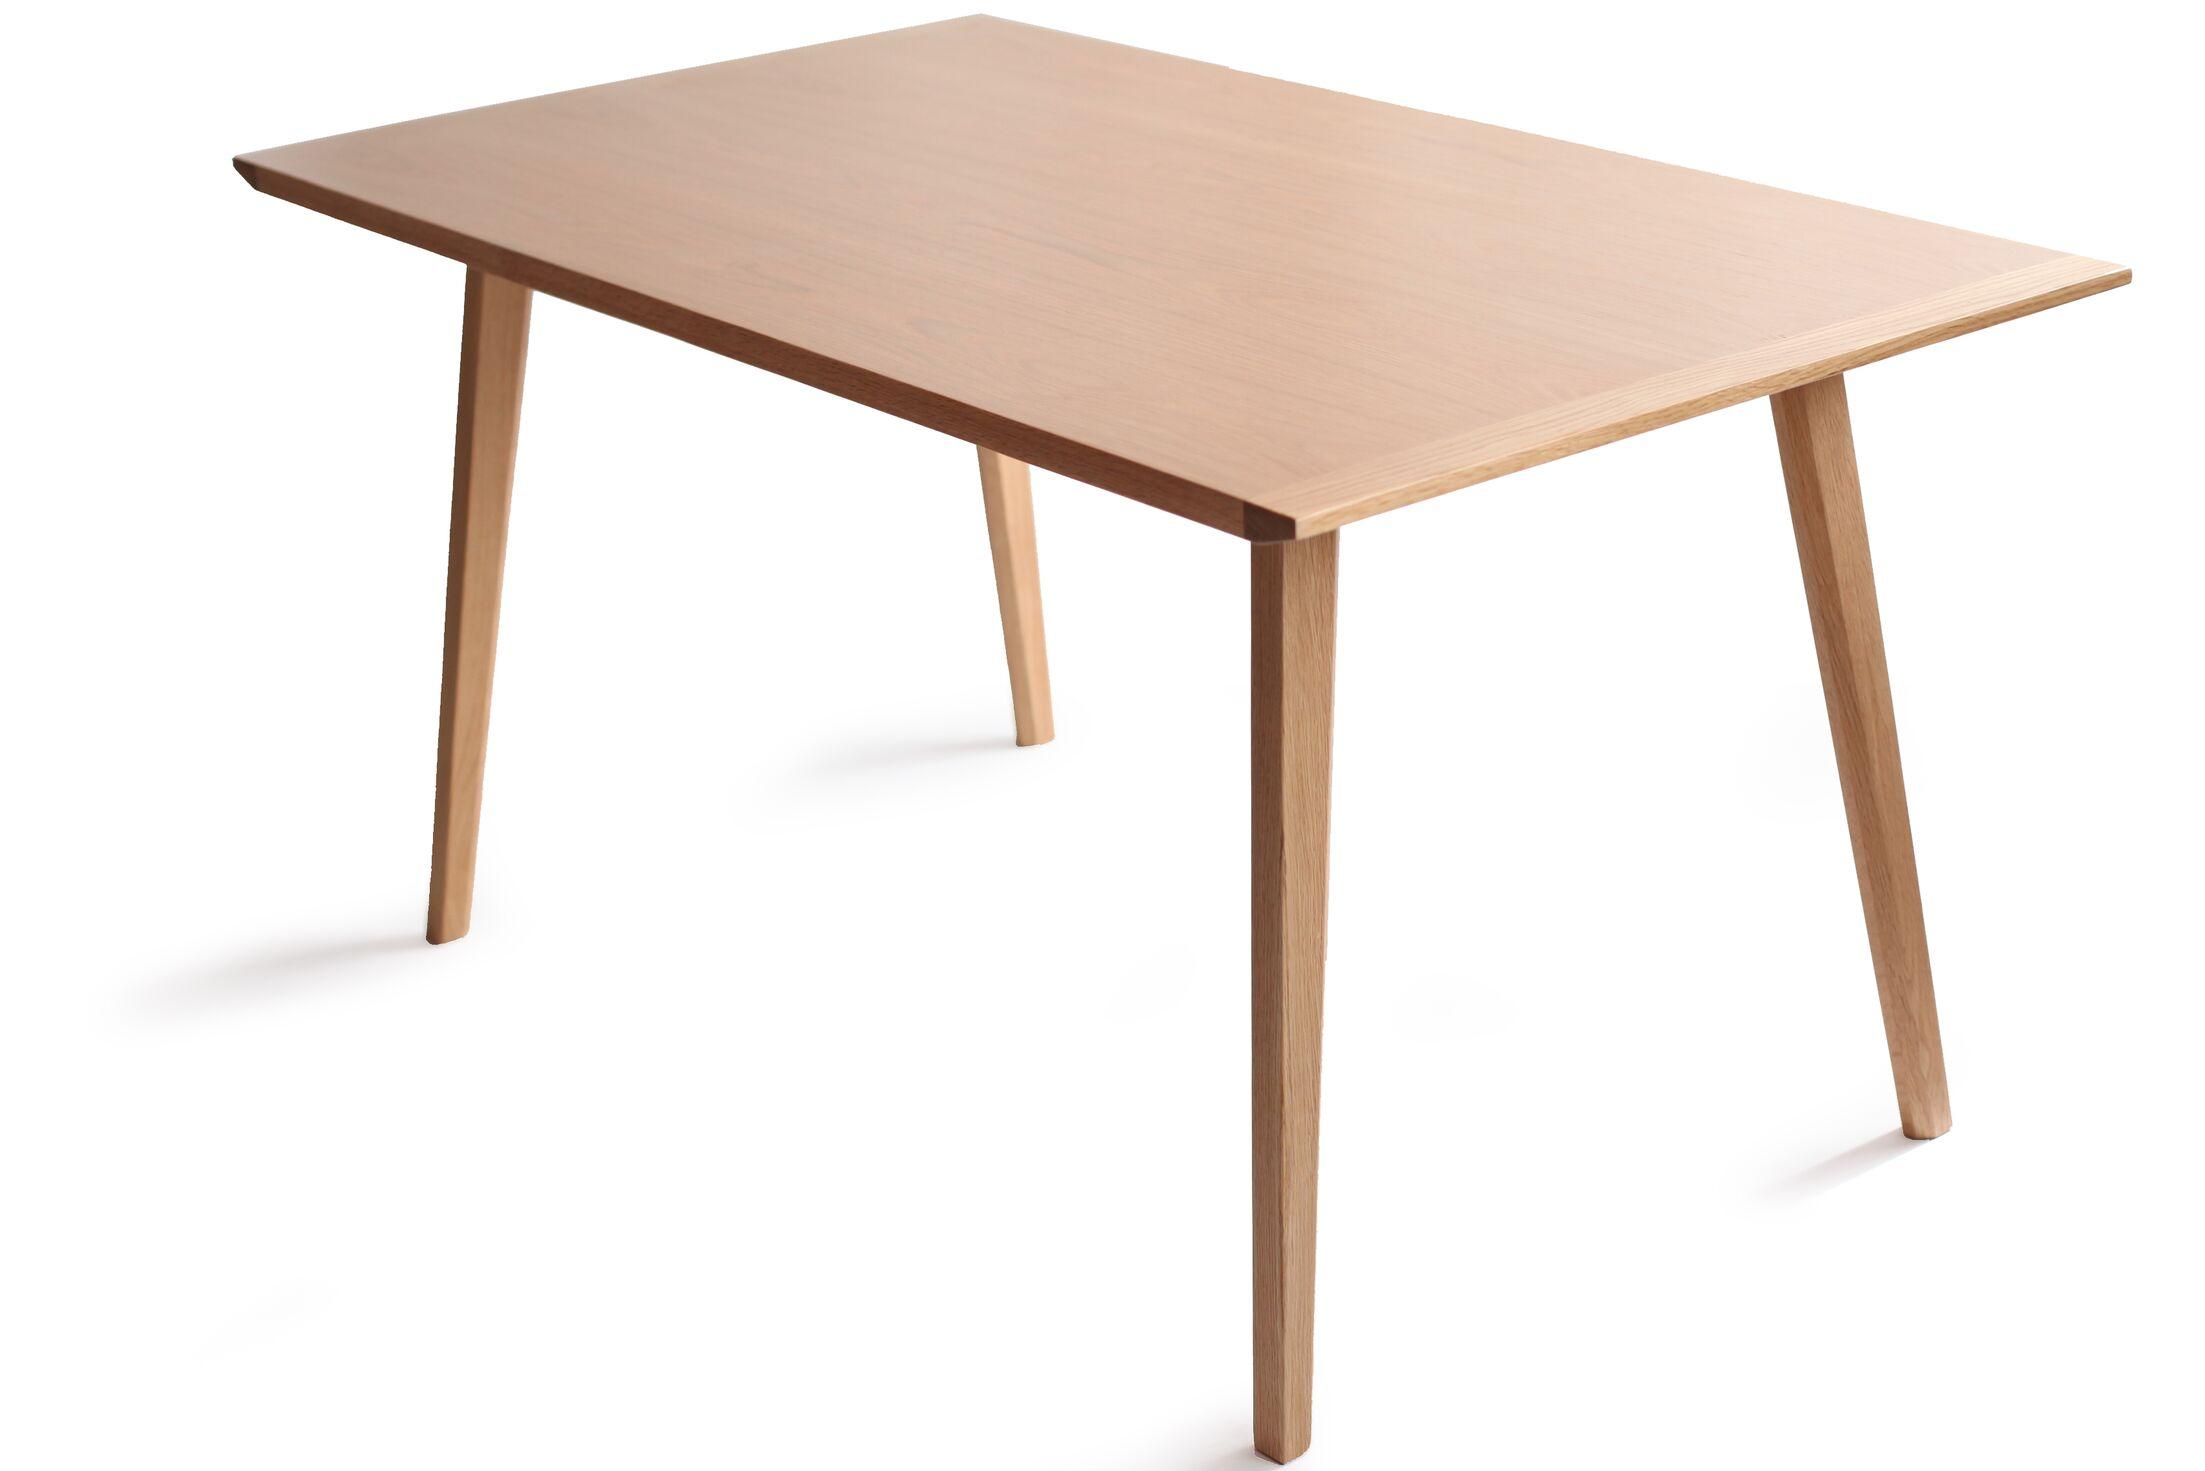 Fairlawn Dining Table Finish: Oak